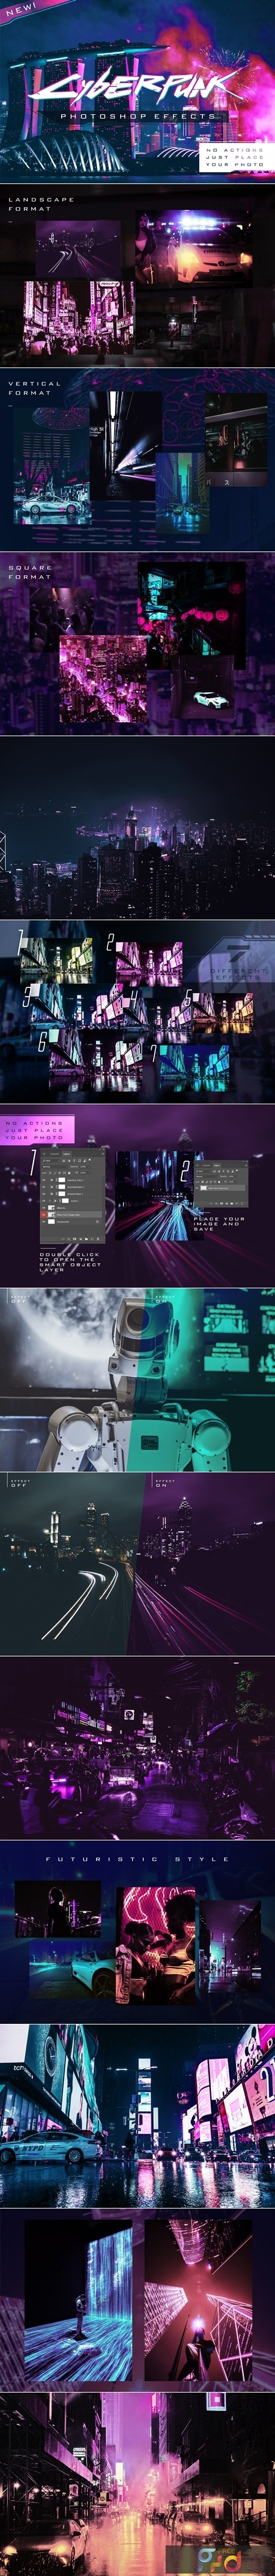 Cyberpunk Photoshop Effects 4570682 1